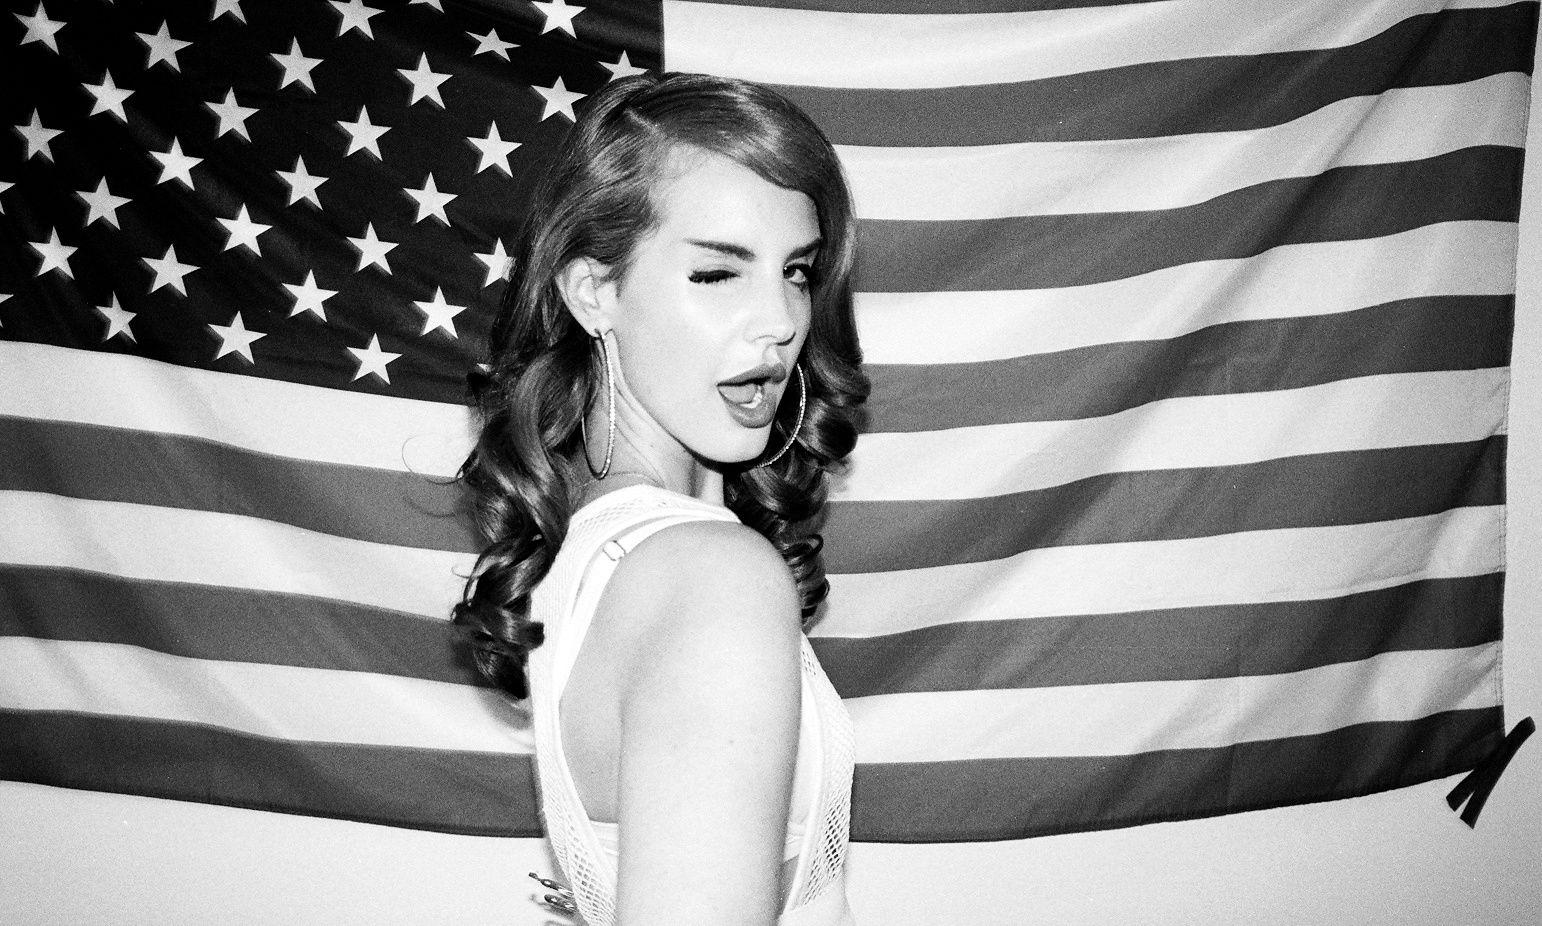 Lana Del Rey Wallpapers Wallpaper Cave